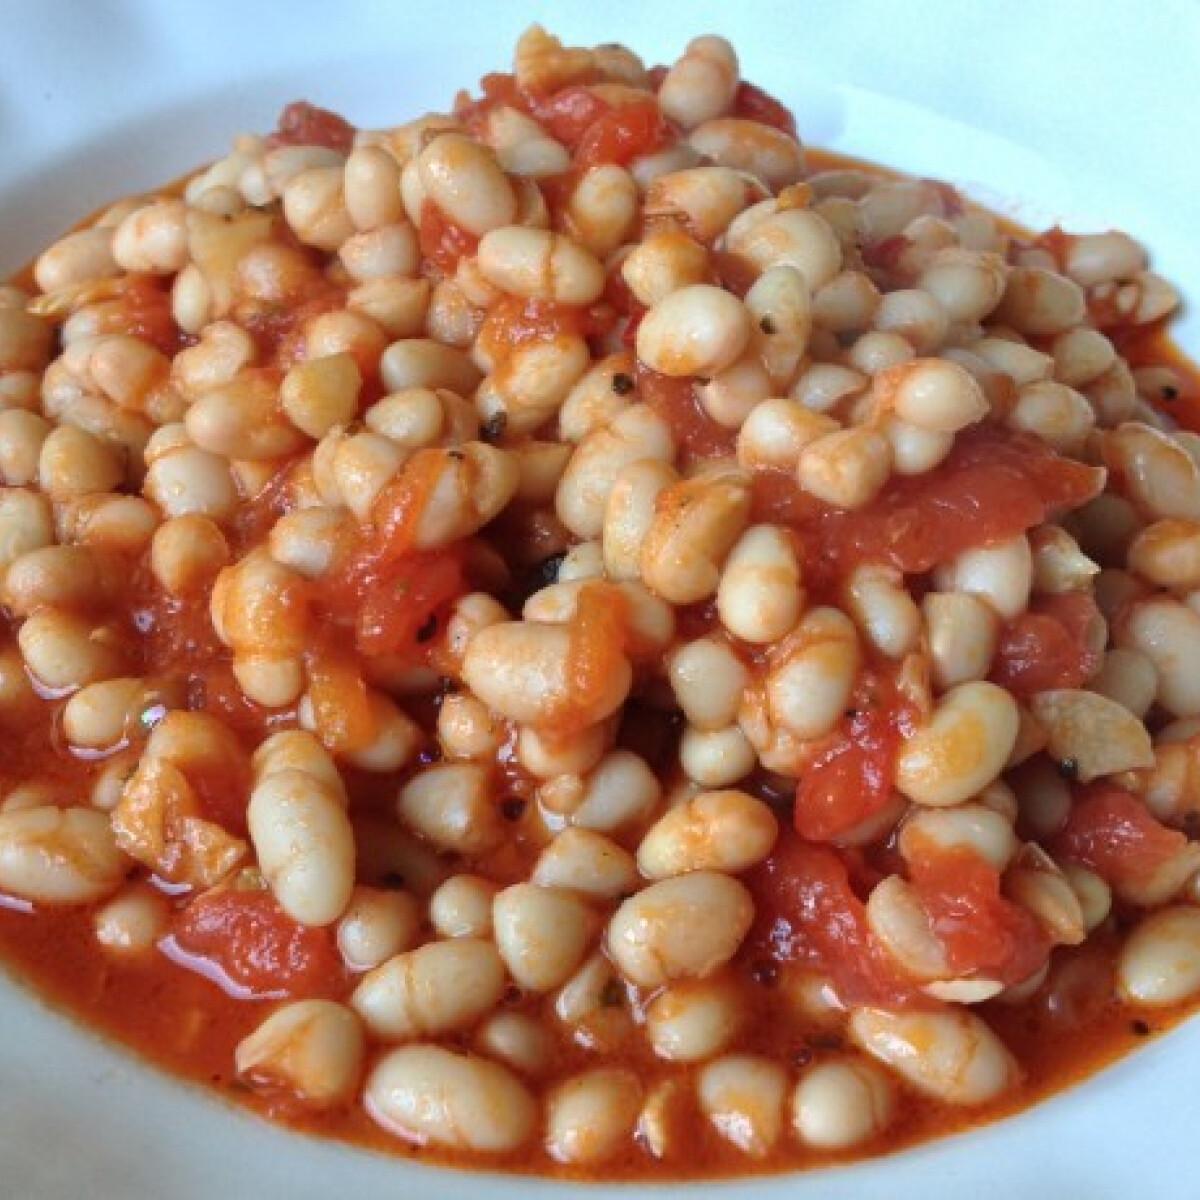 Olaszos főtt bab